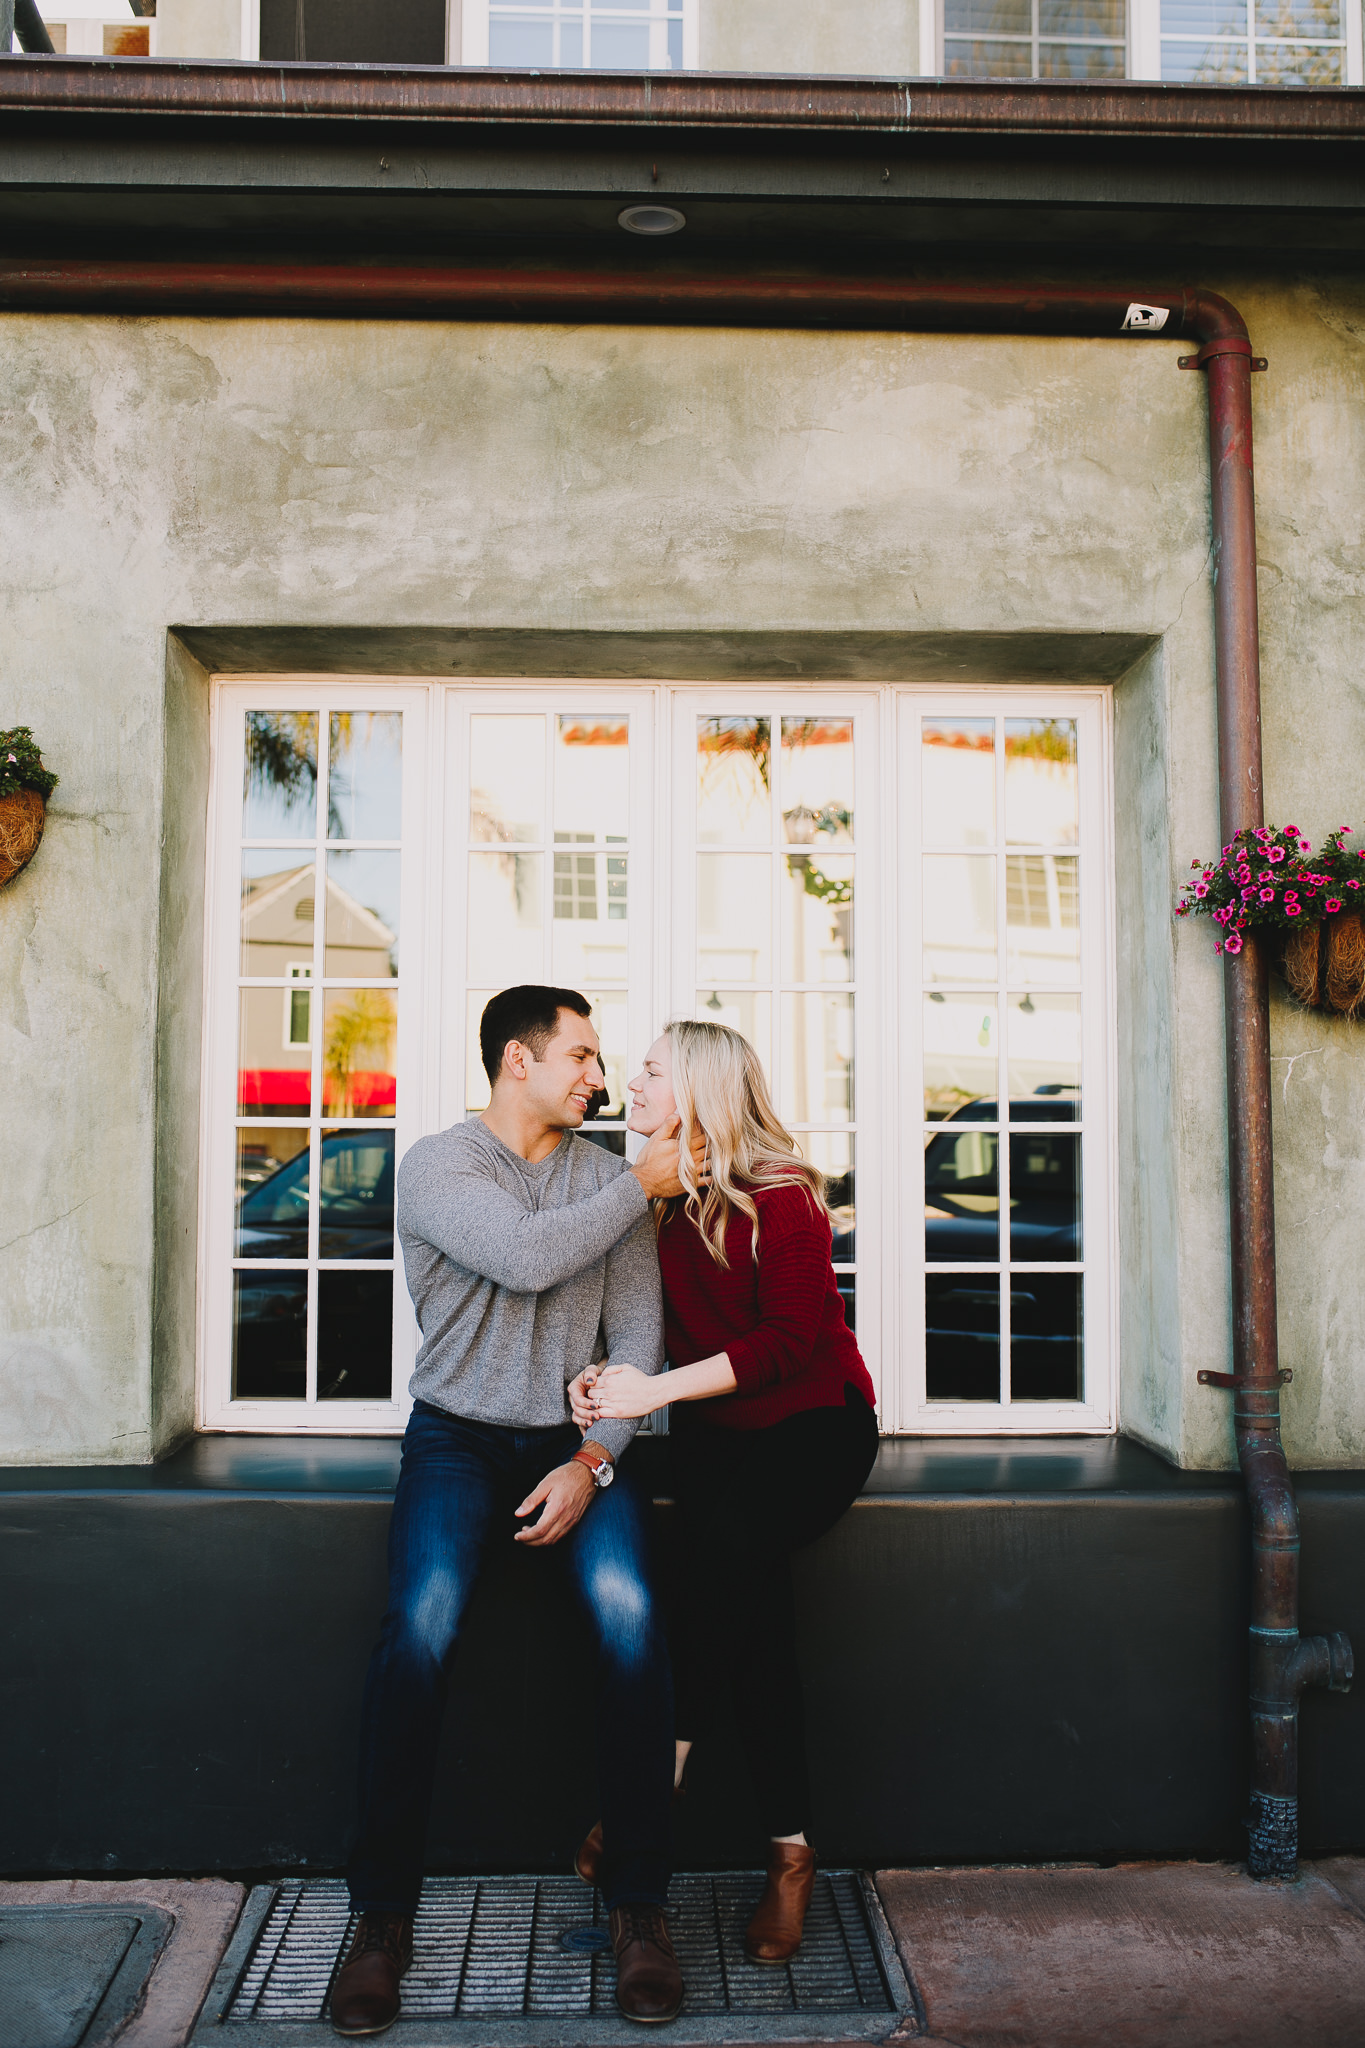 Archer Inspired Photography Capitola Beach Santa Cruz Wedding Engagement Lifestyle Session Photographer-54.jpg